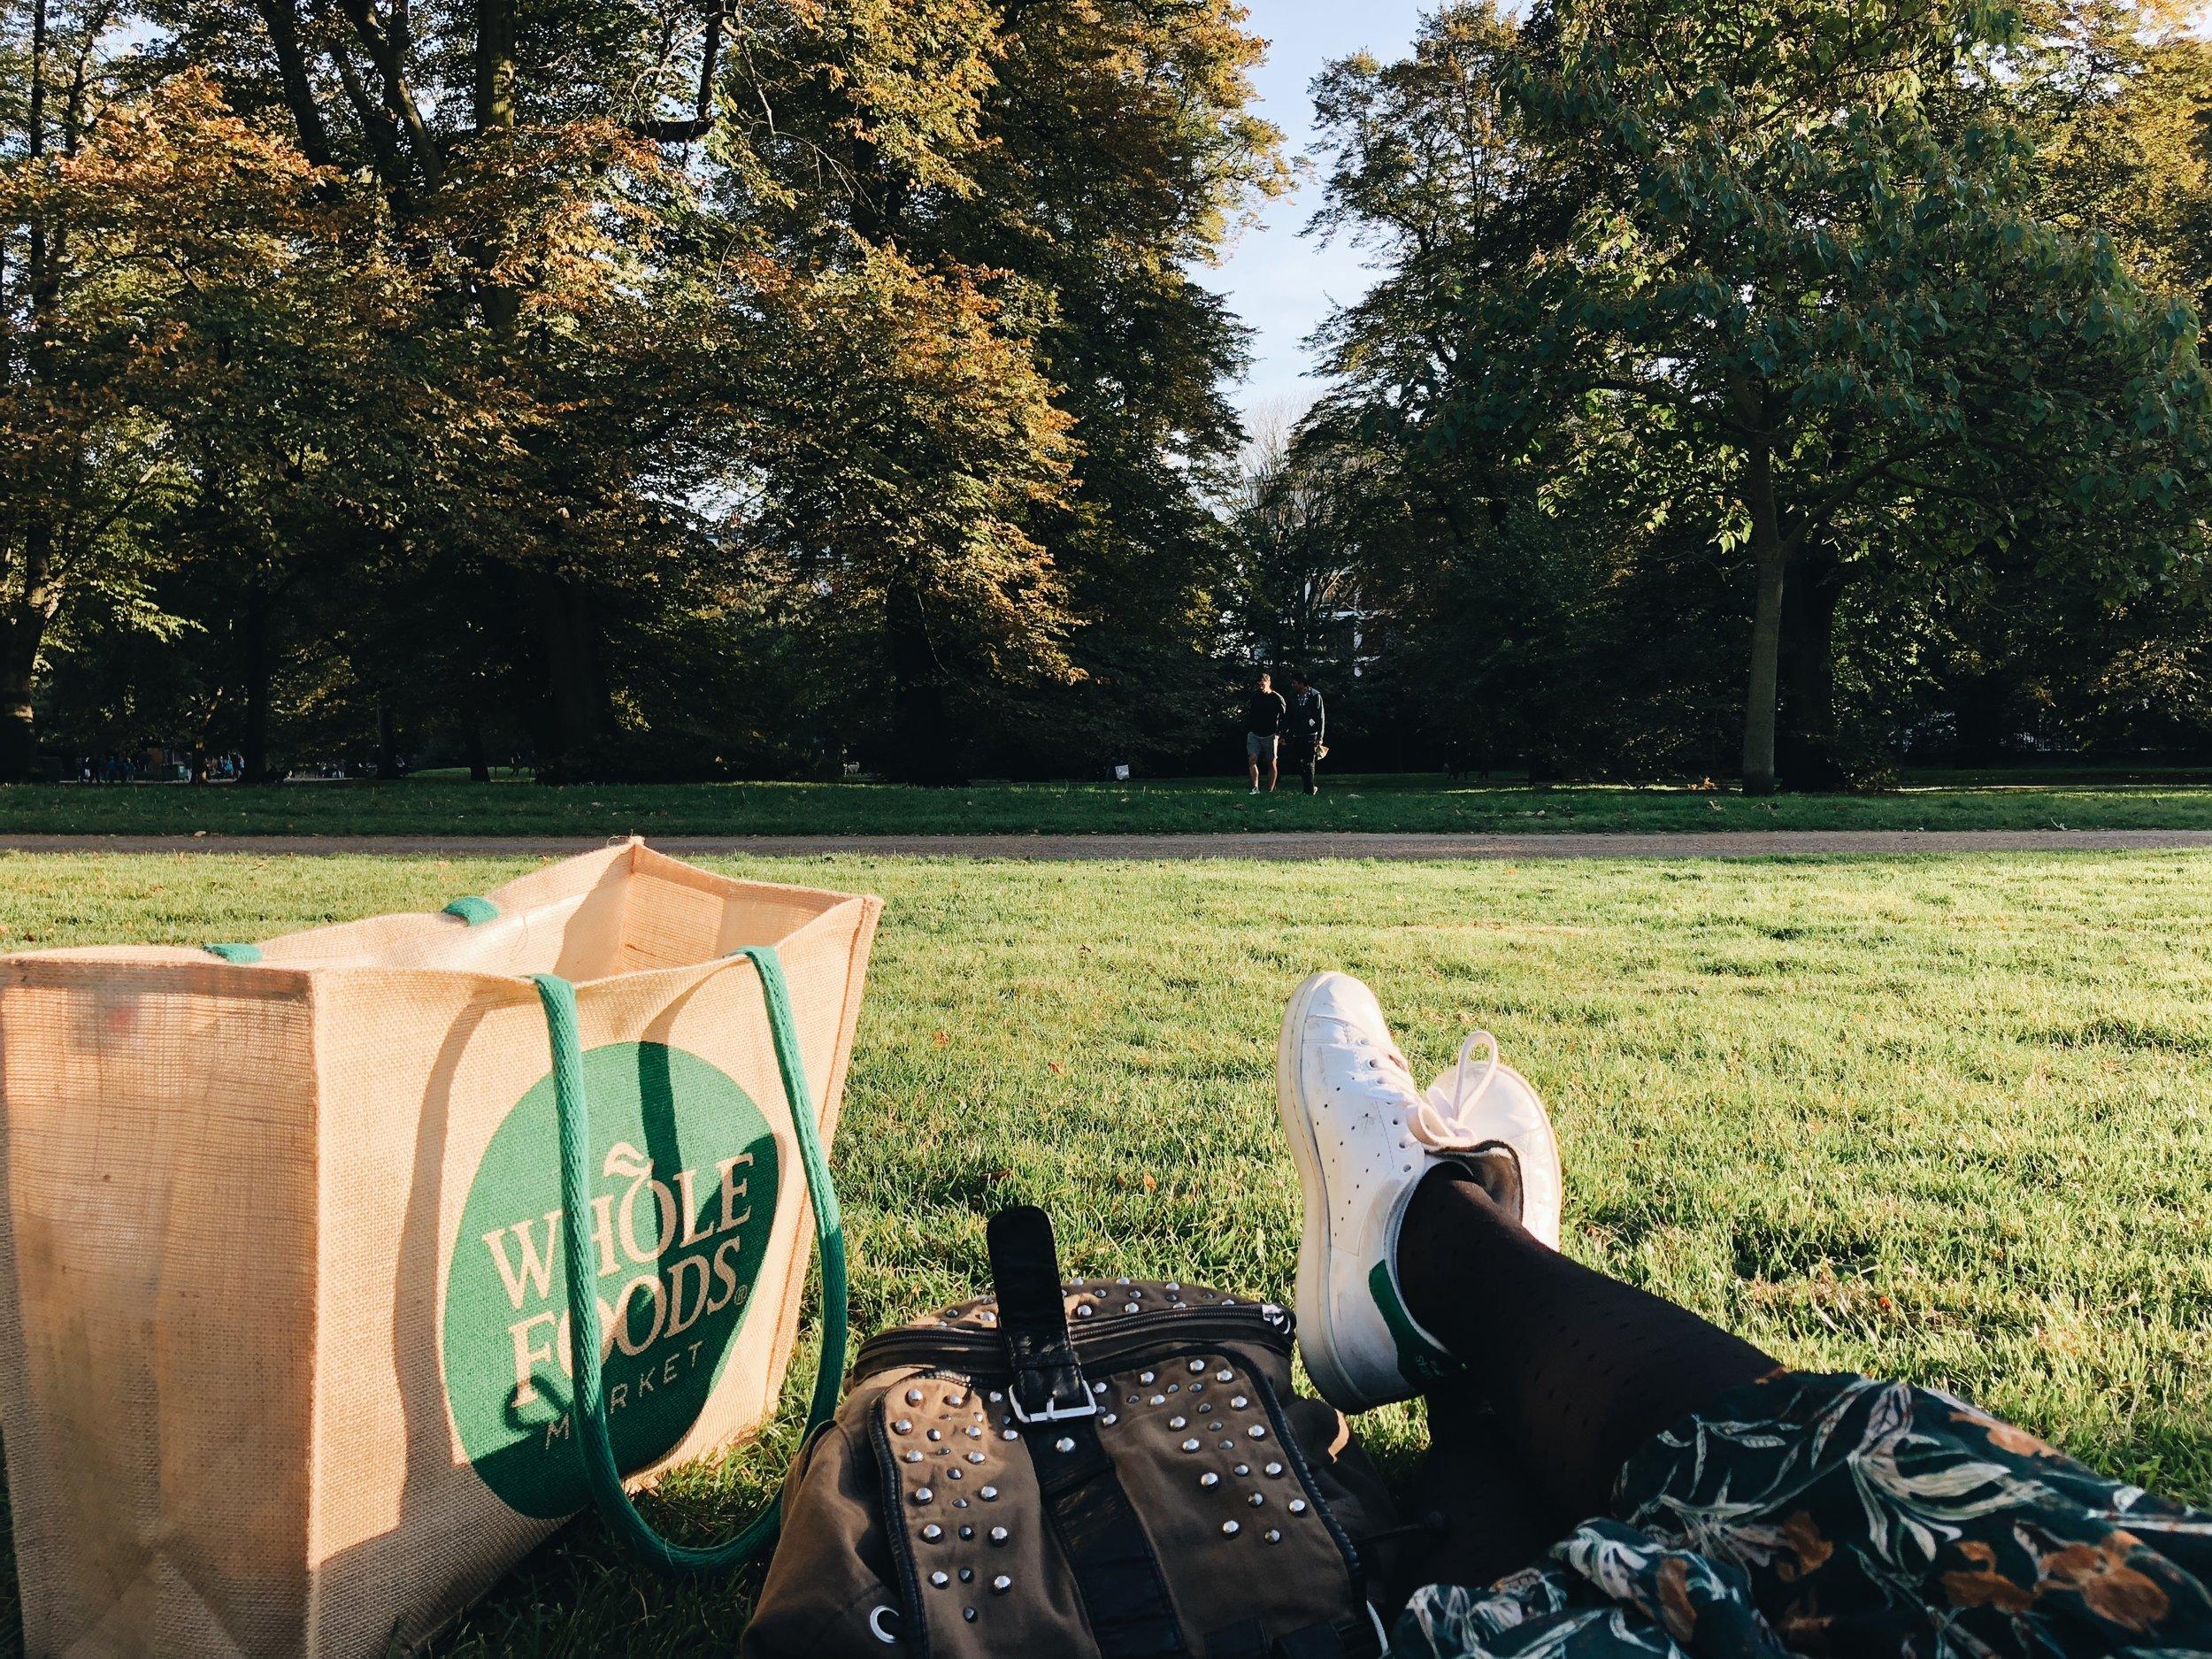 whole-food-market-kensington-gardens.JPG